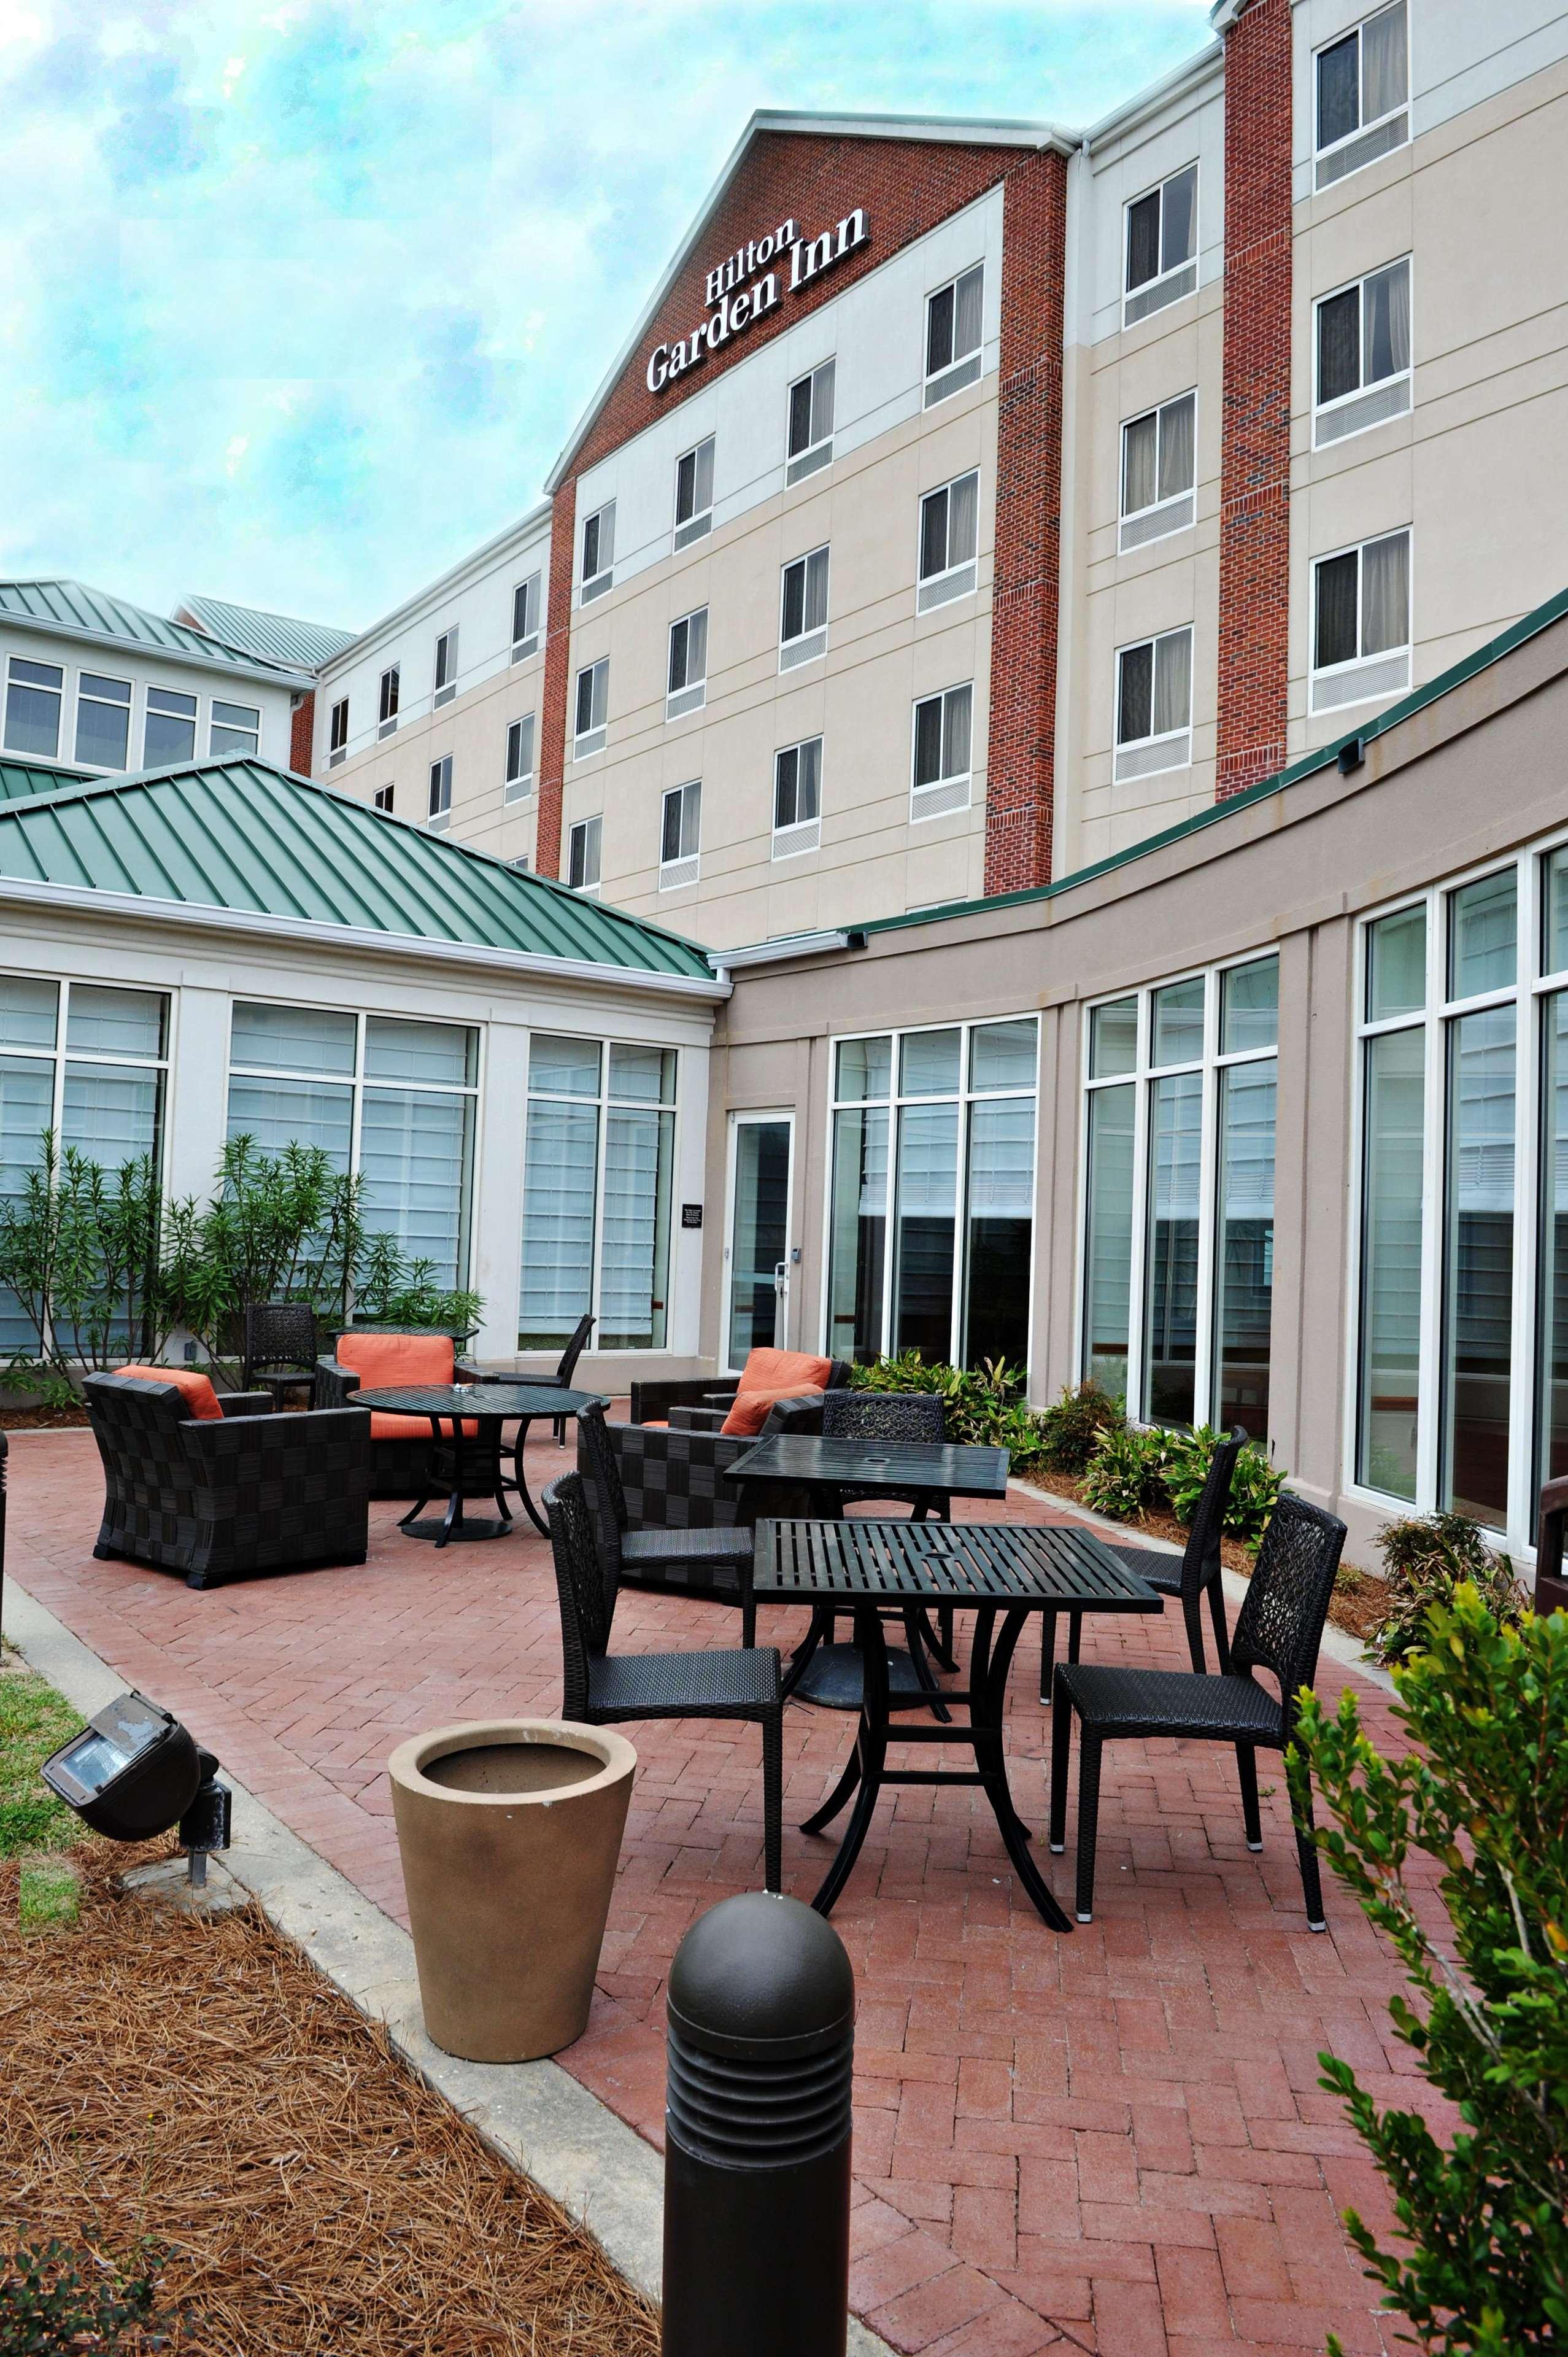 Hilton Garden Inn West Monroe